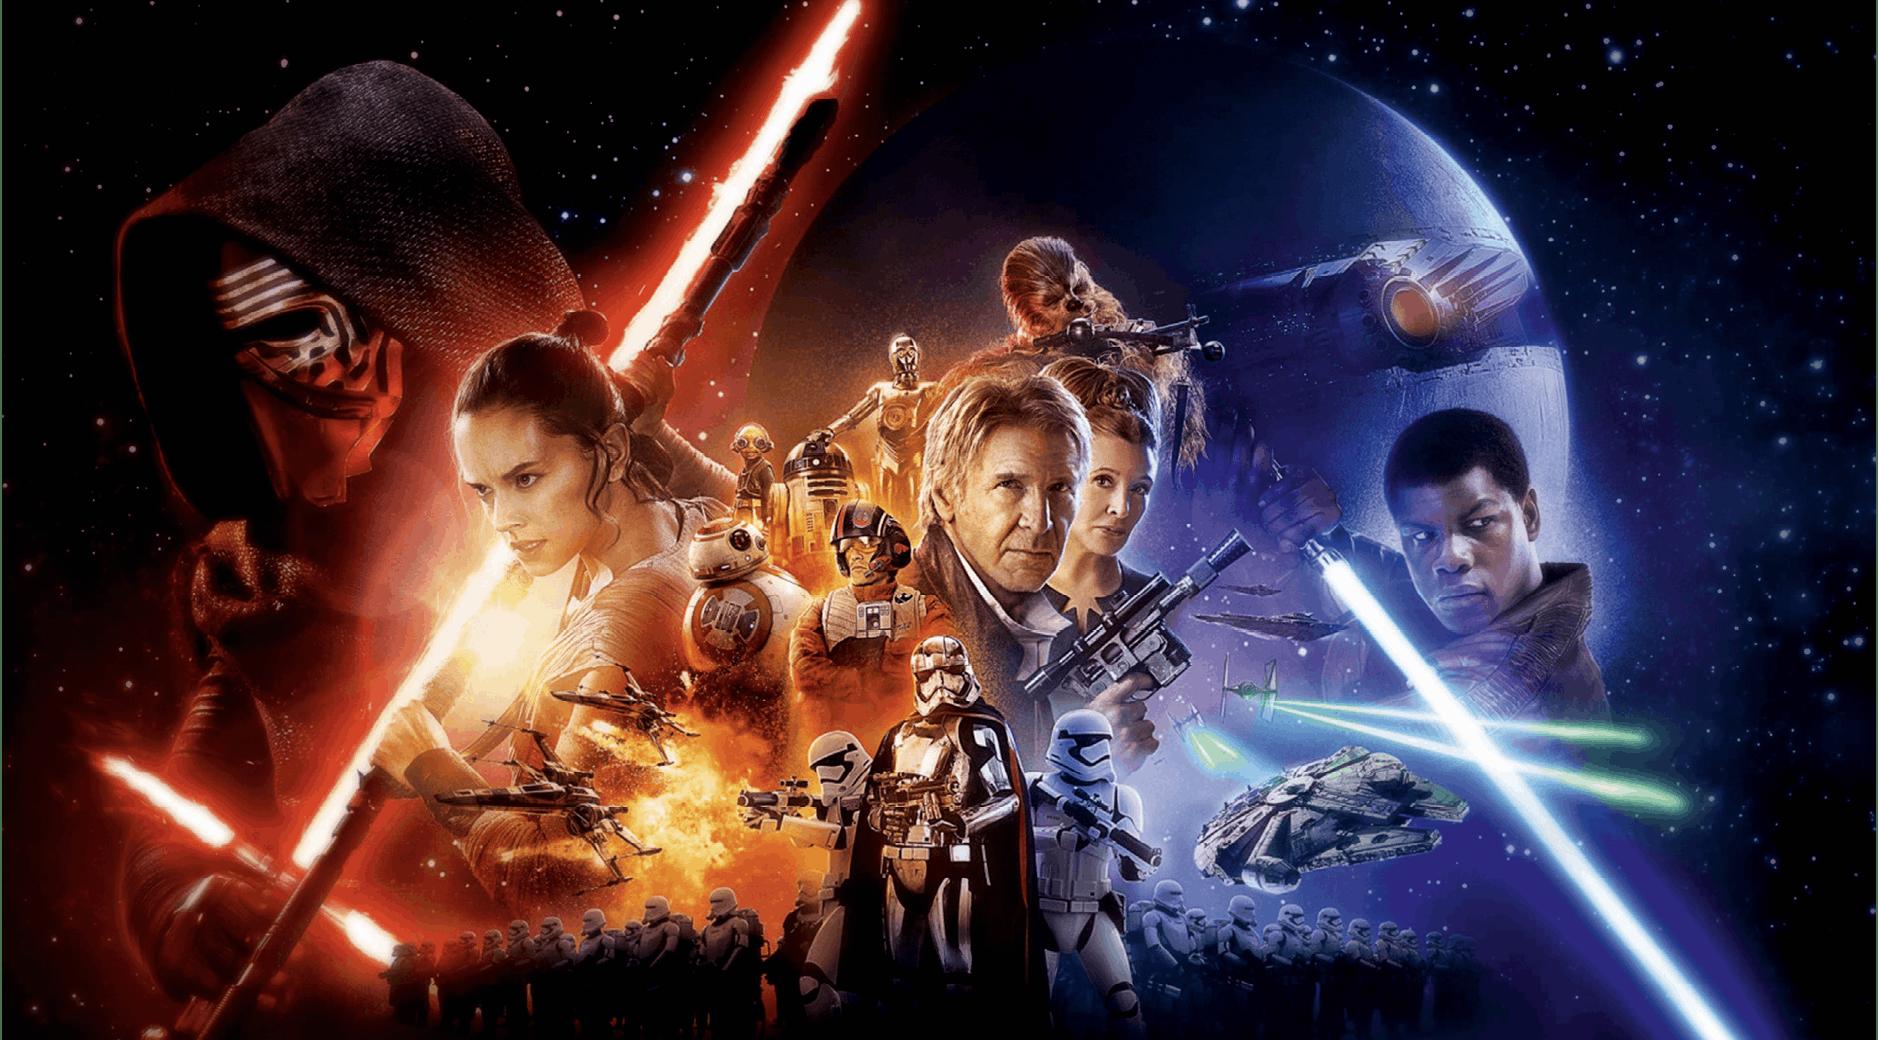 Star Wars poster 2015